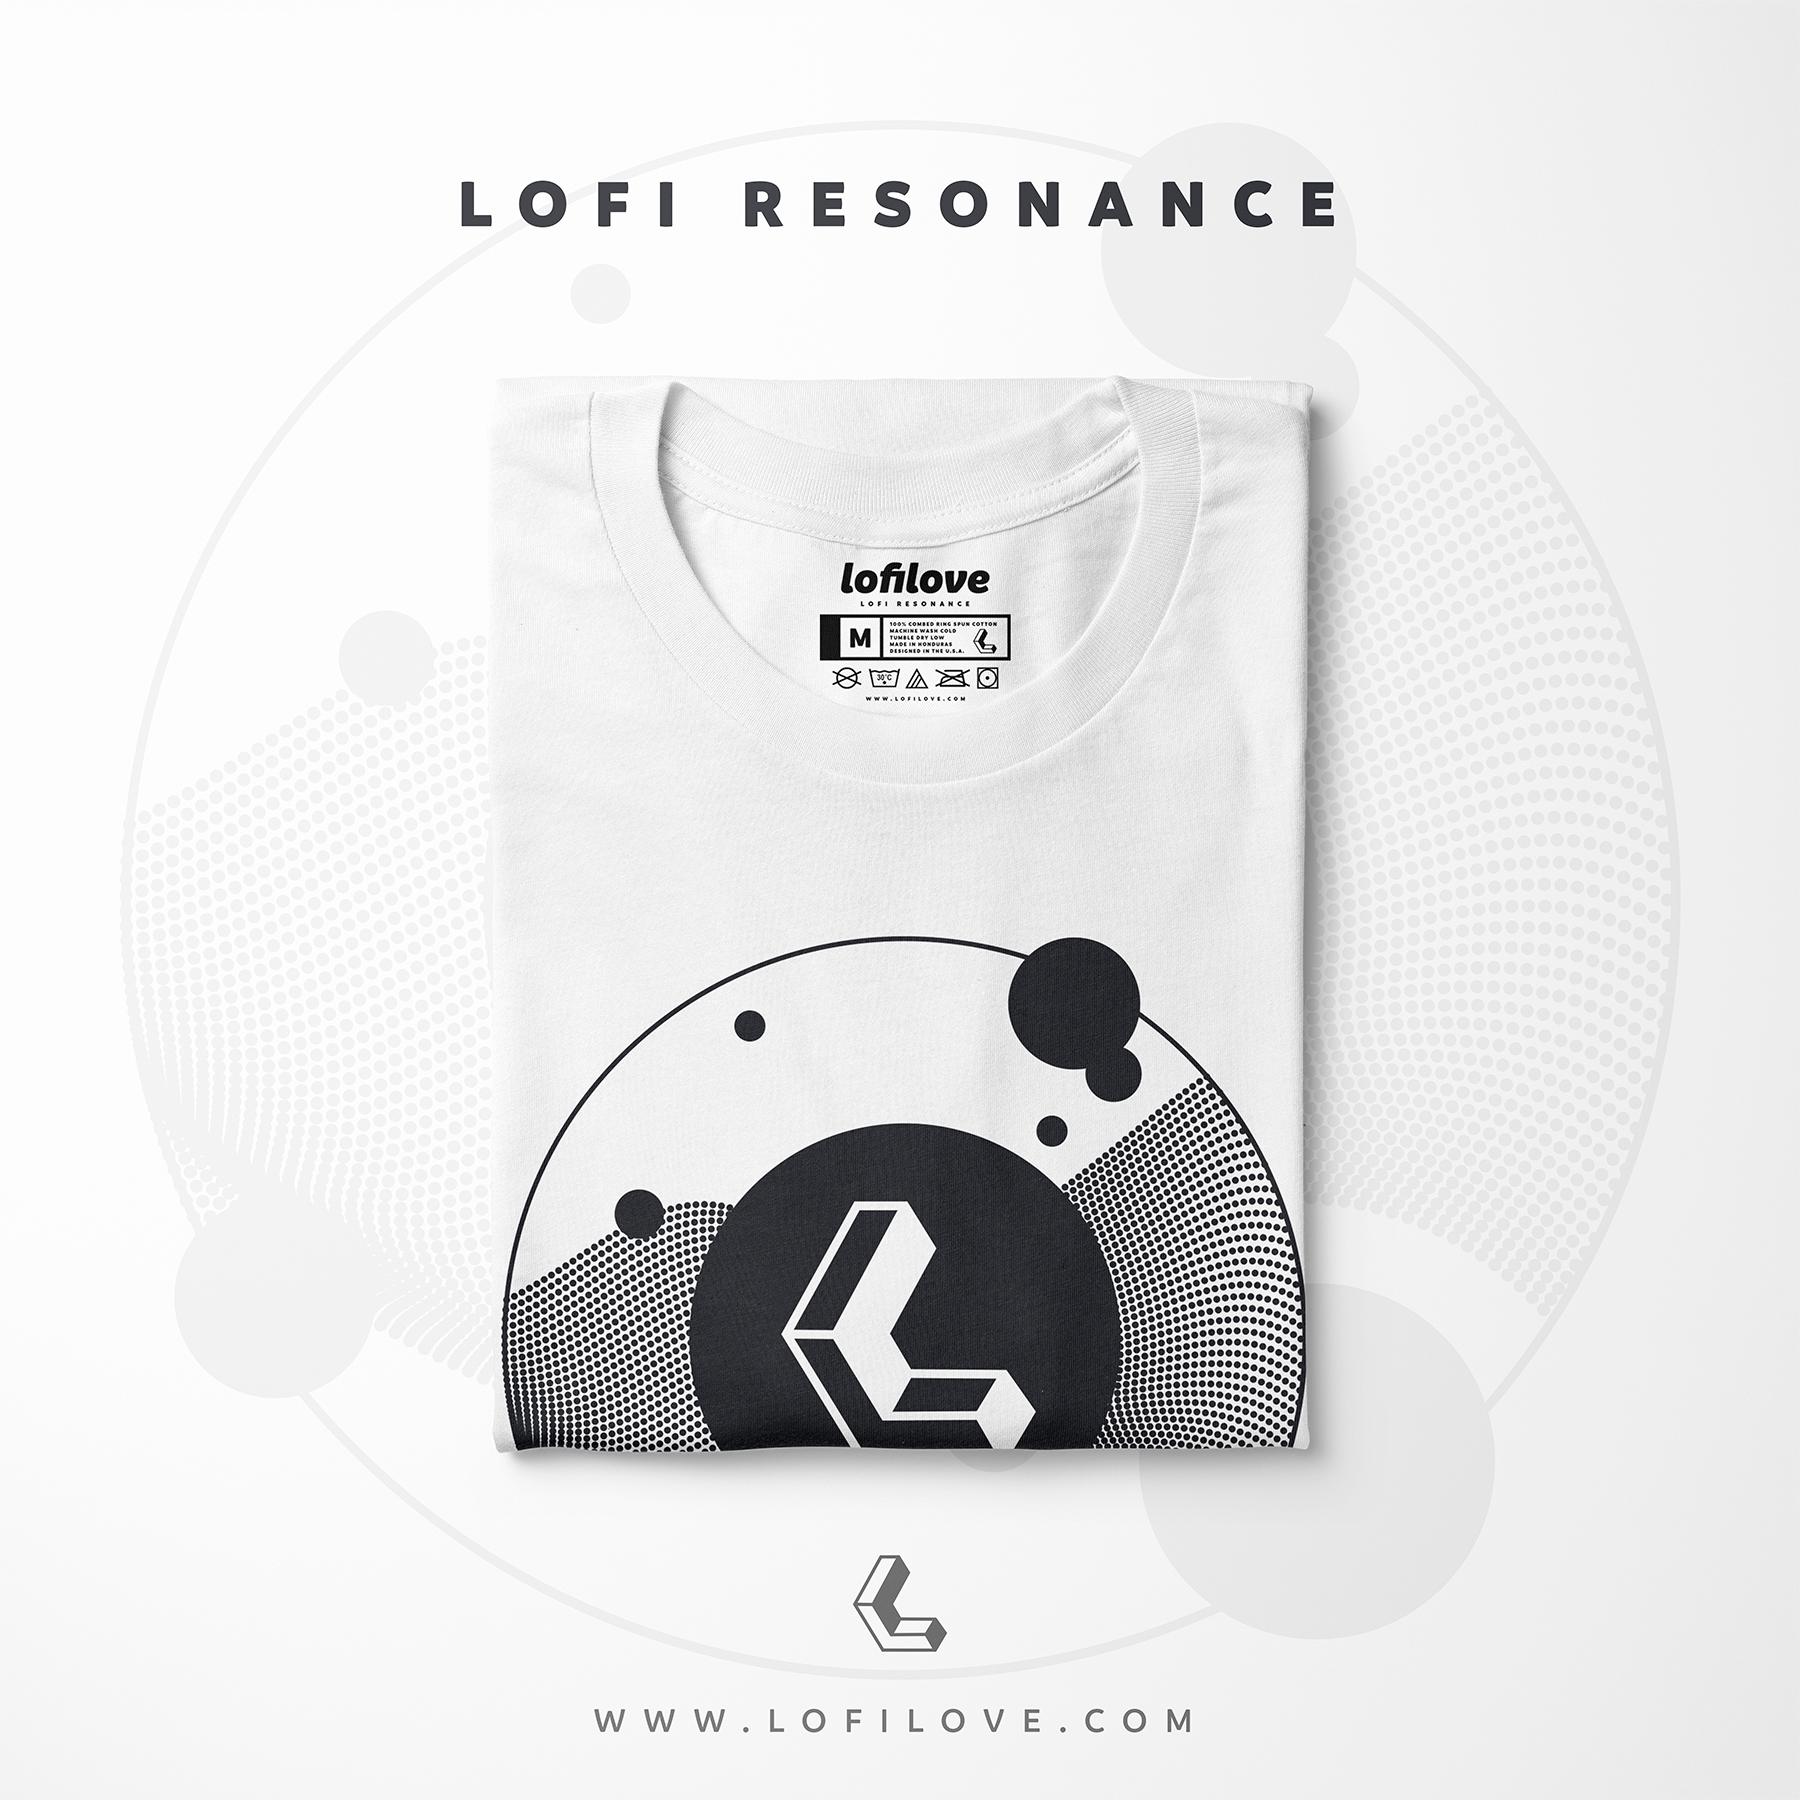 lofilove-lofi-resonance-tee-2